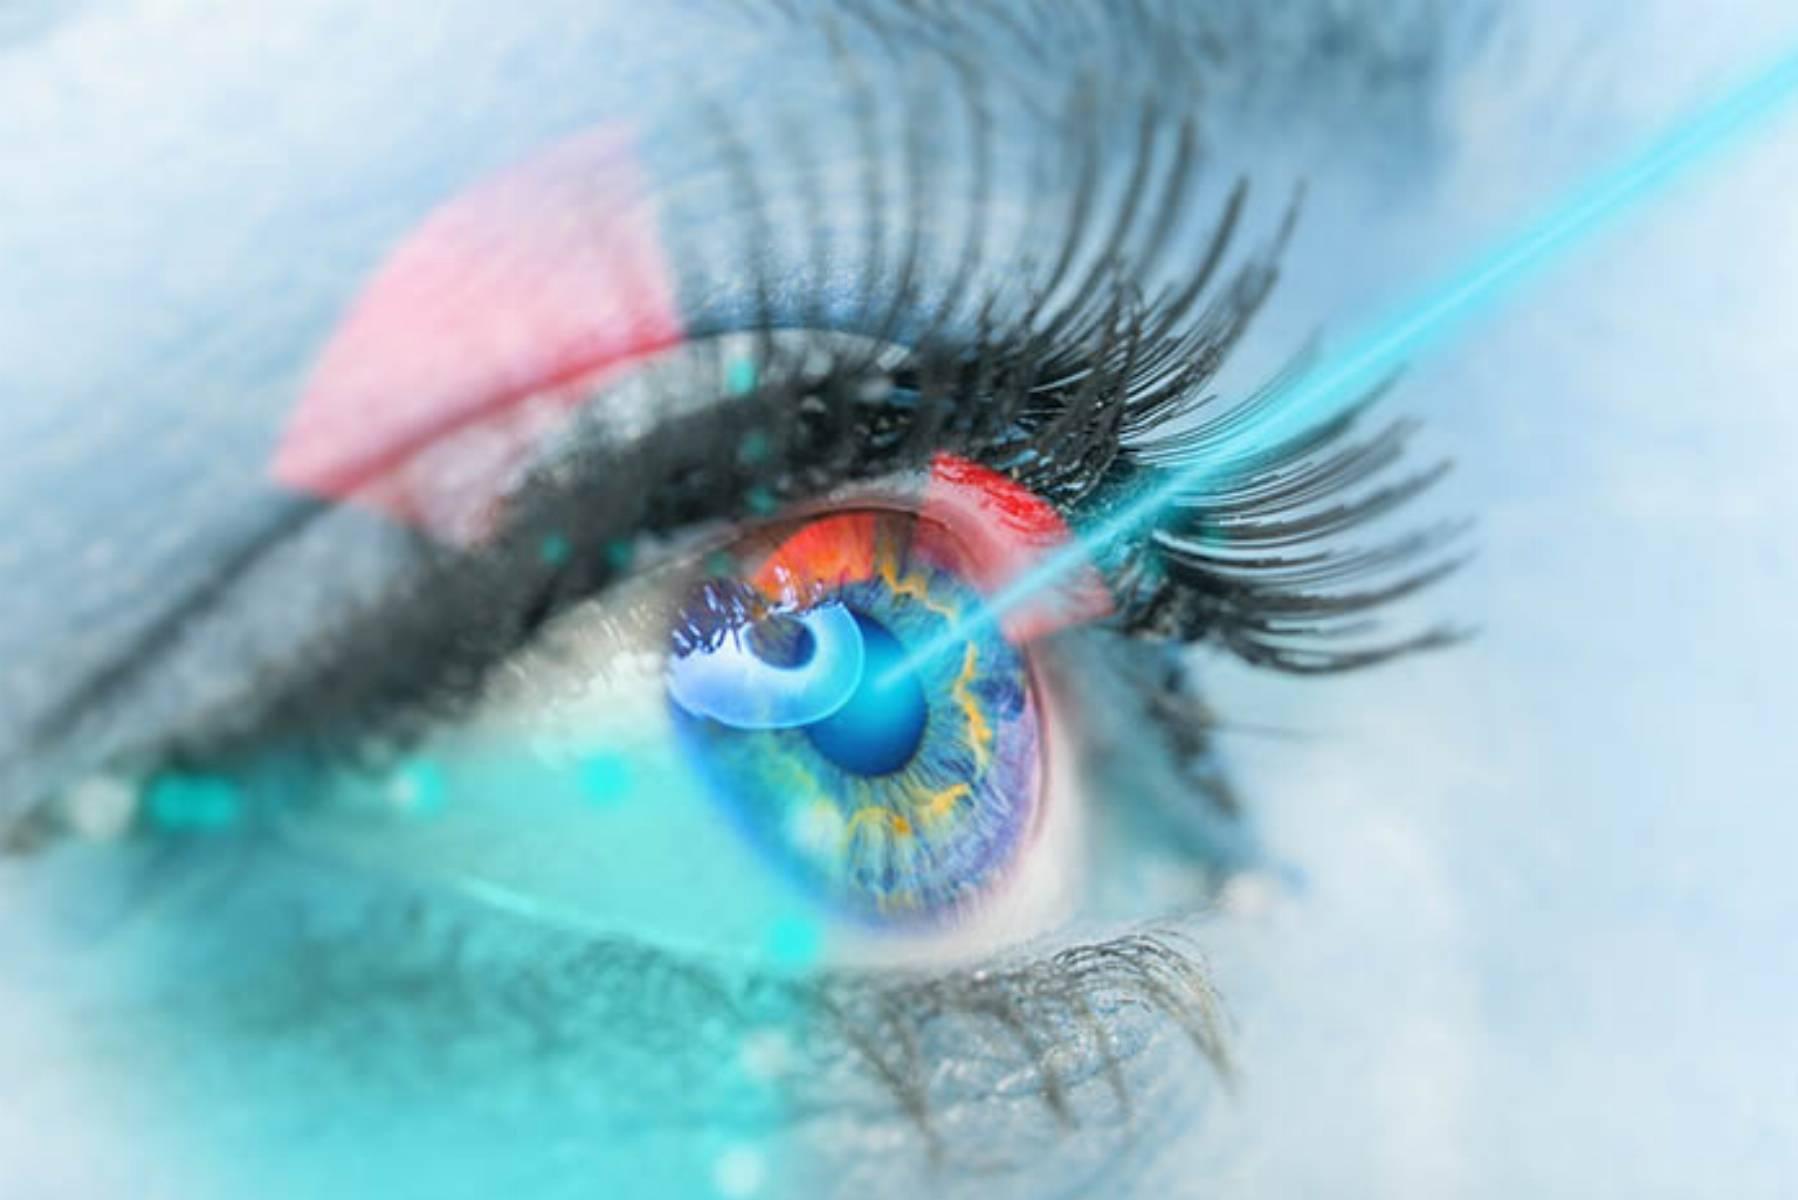 Close up of a female eye